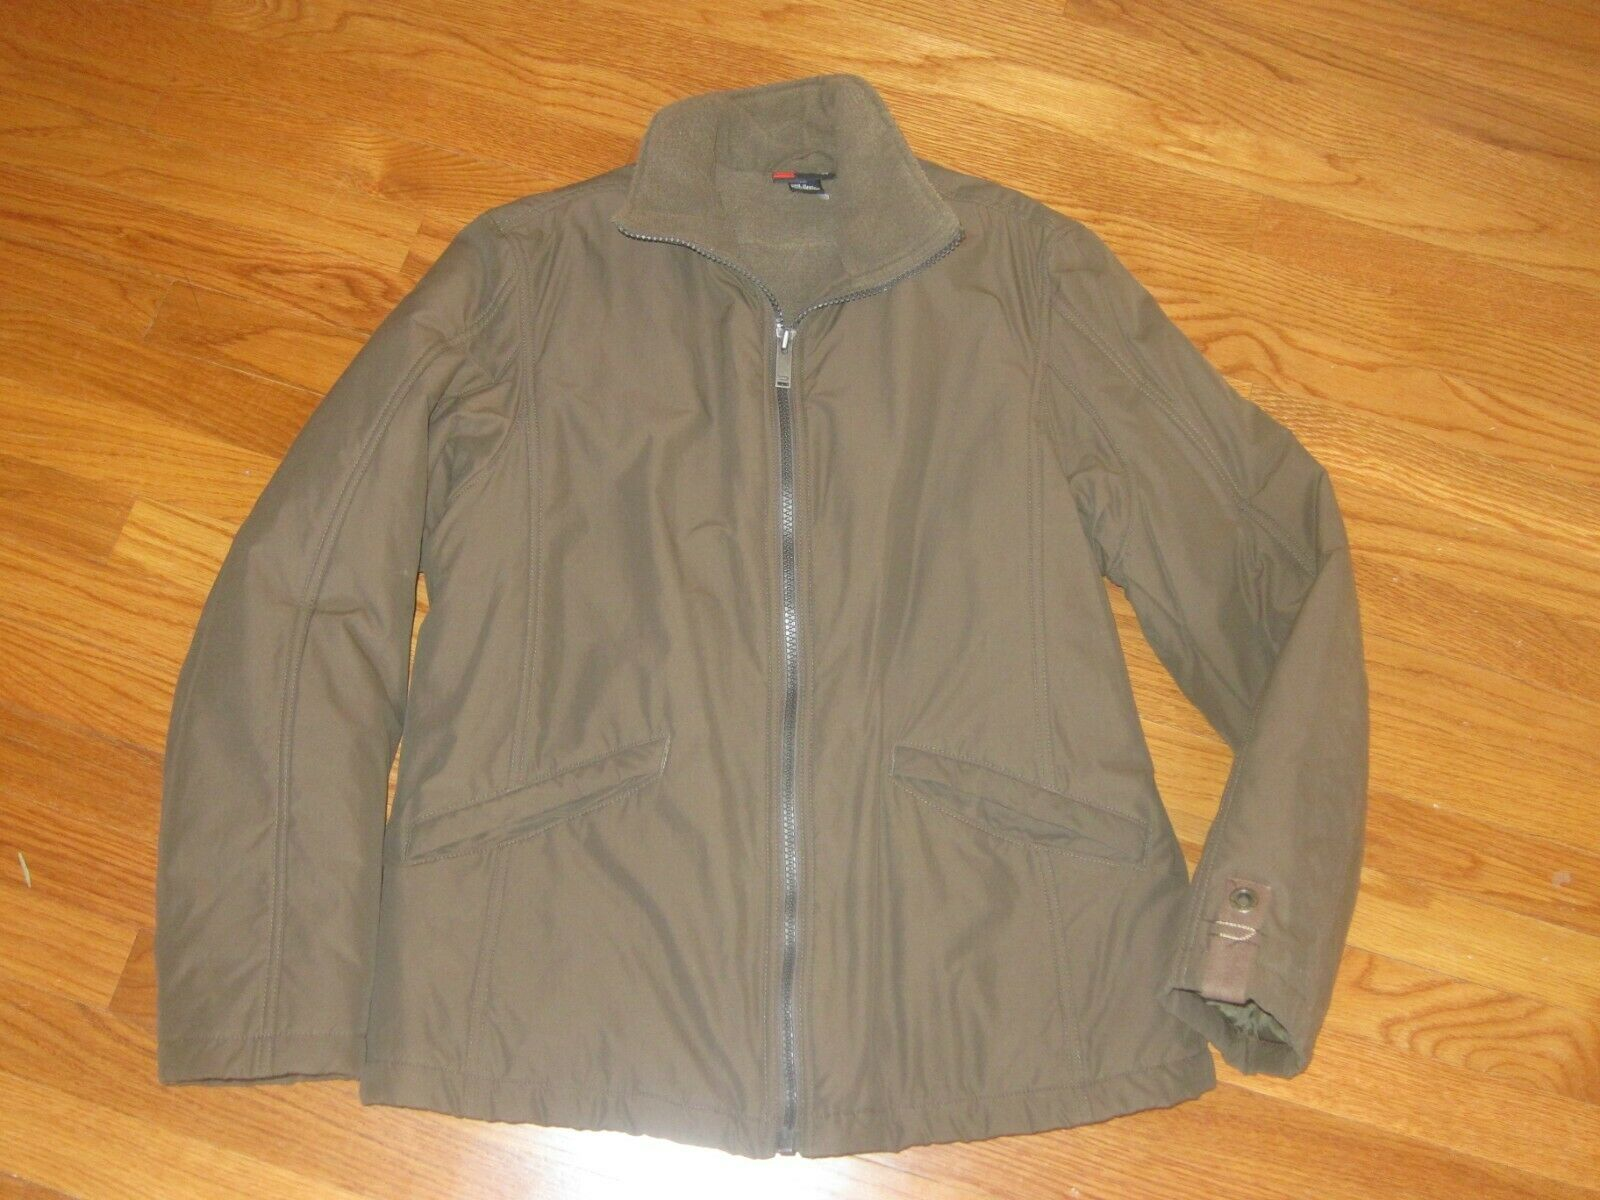 Diesel Brand Mens Coat Jacket Olive Army Grün Größe L RN93243